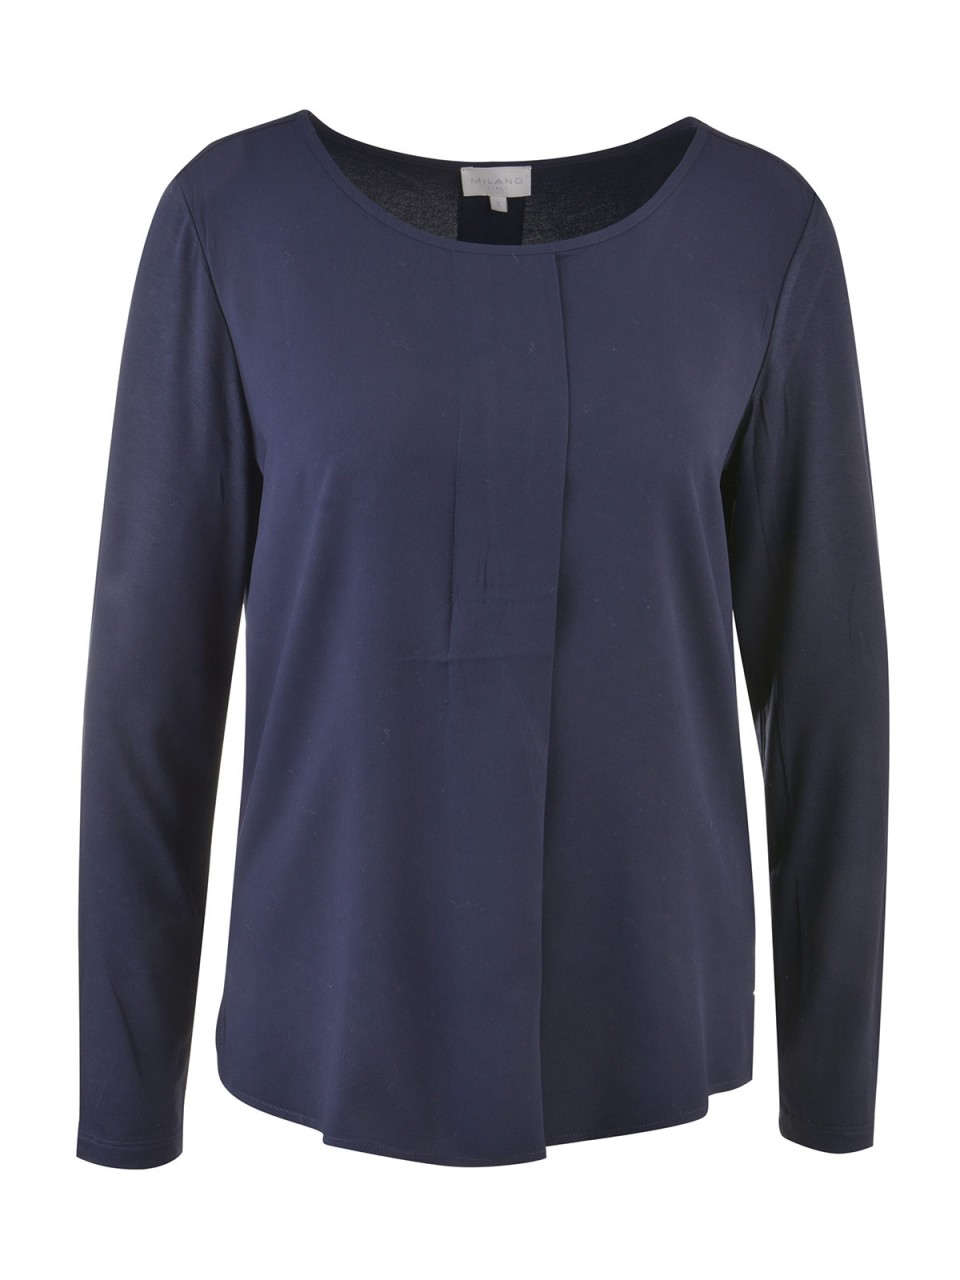 milano-italy-damen-bluse-dunkelblau